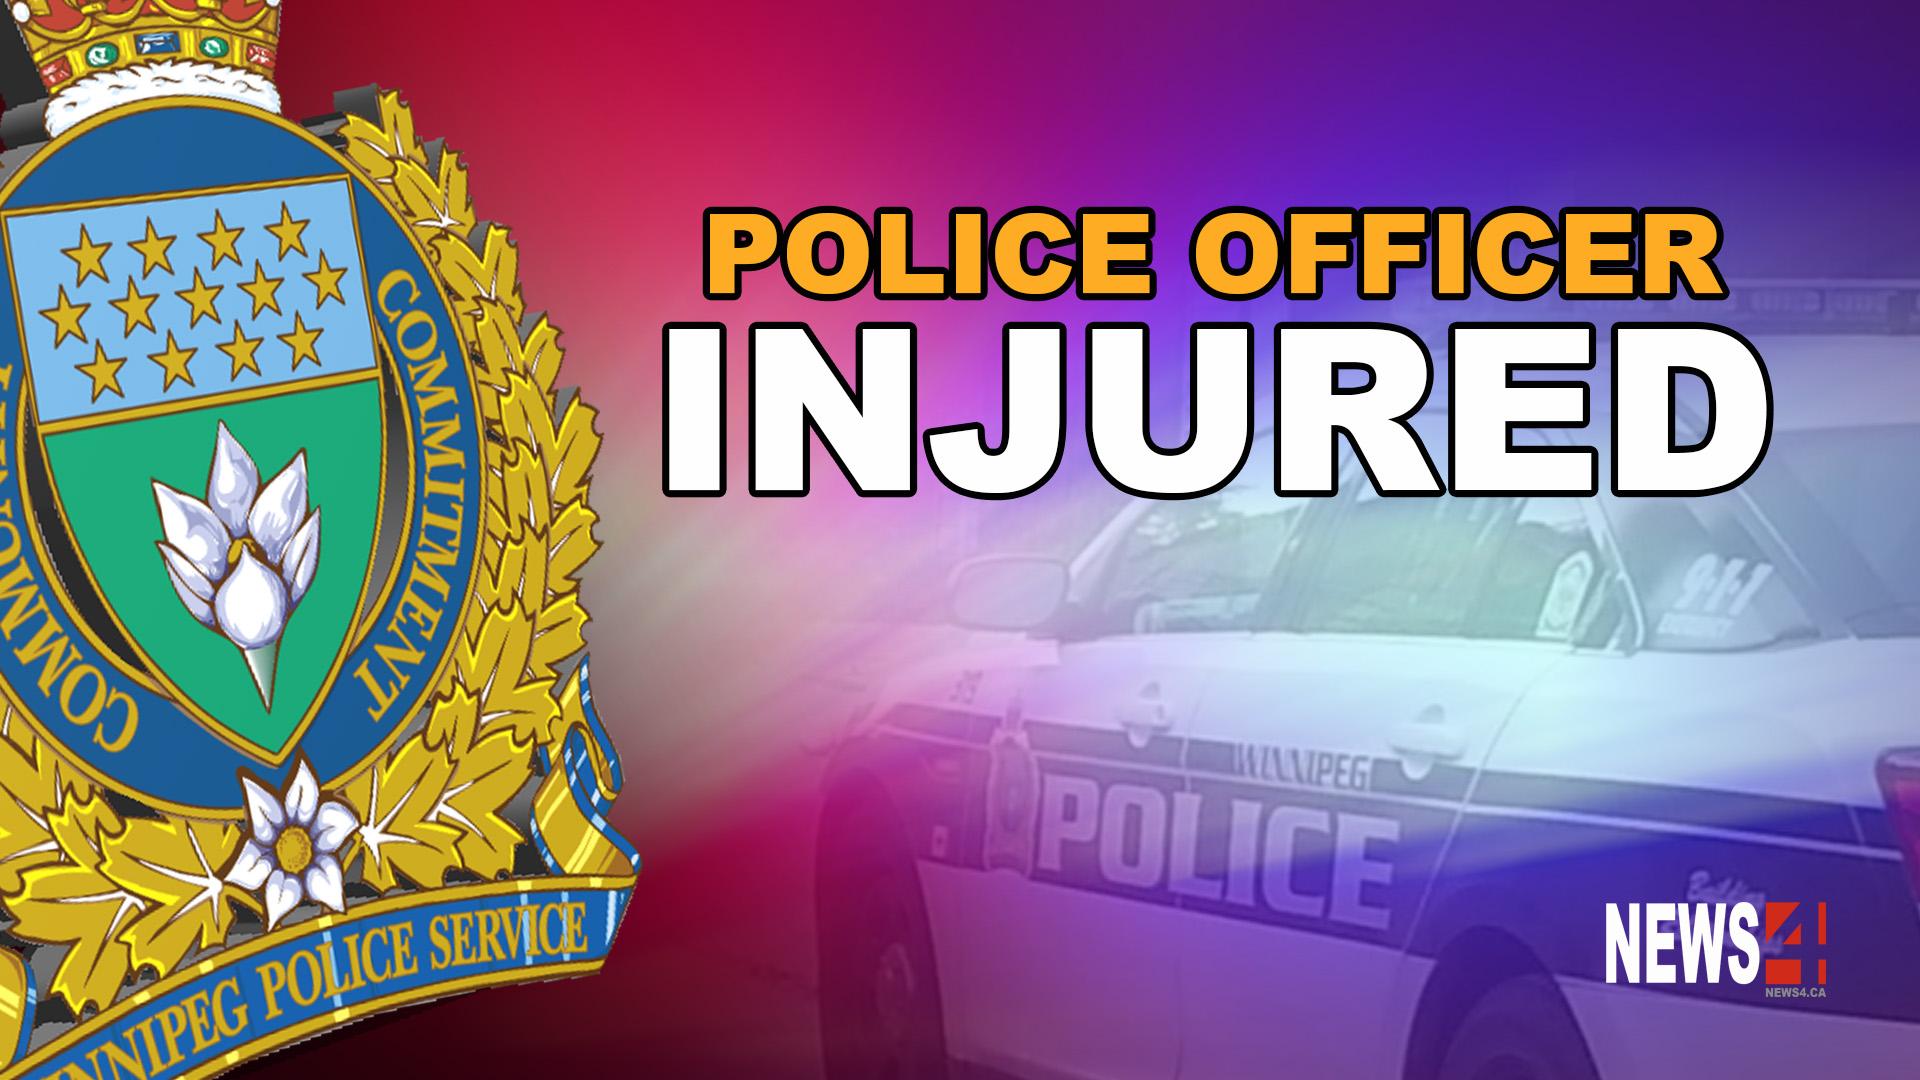 officer injured graphic